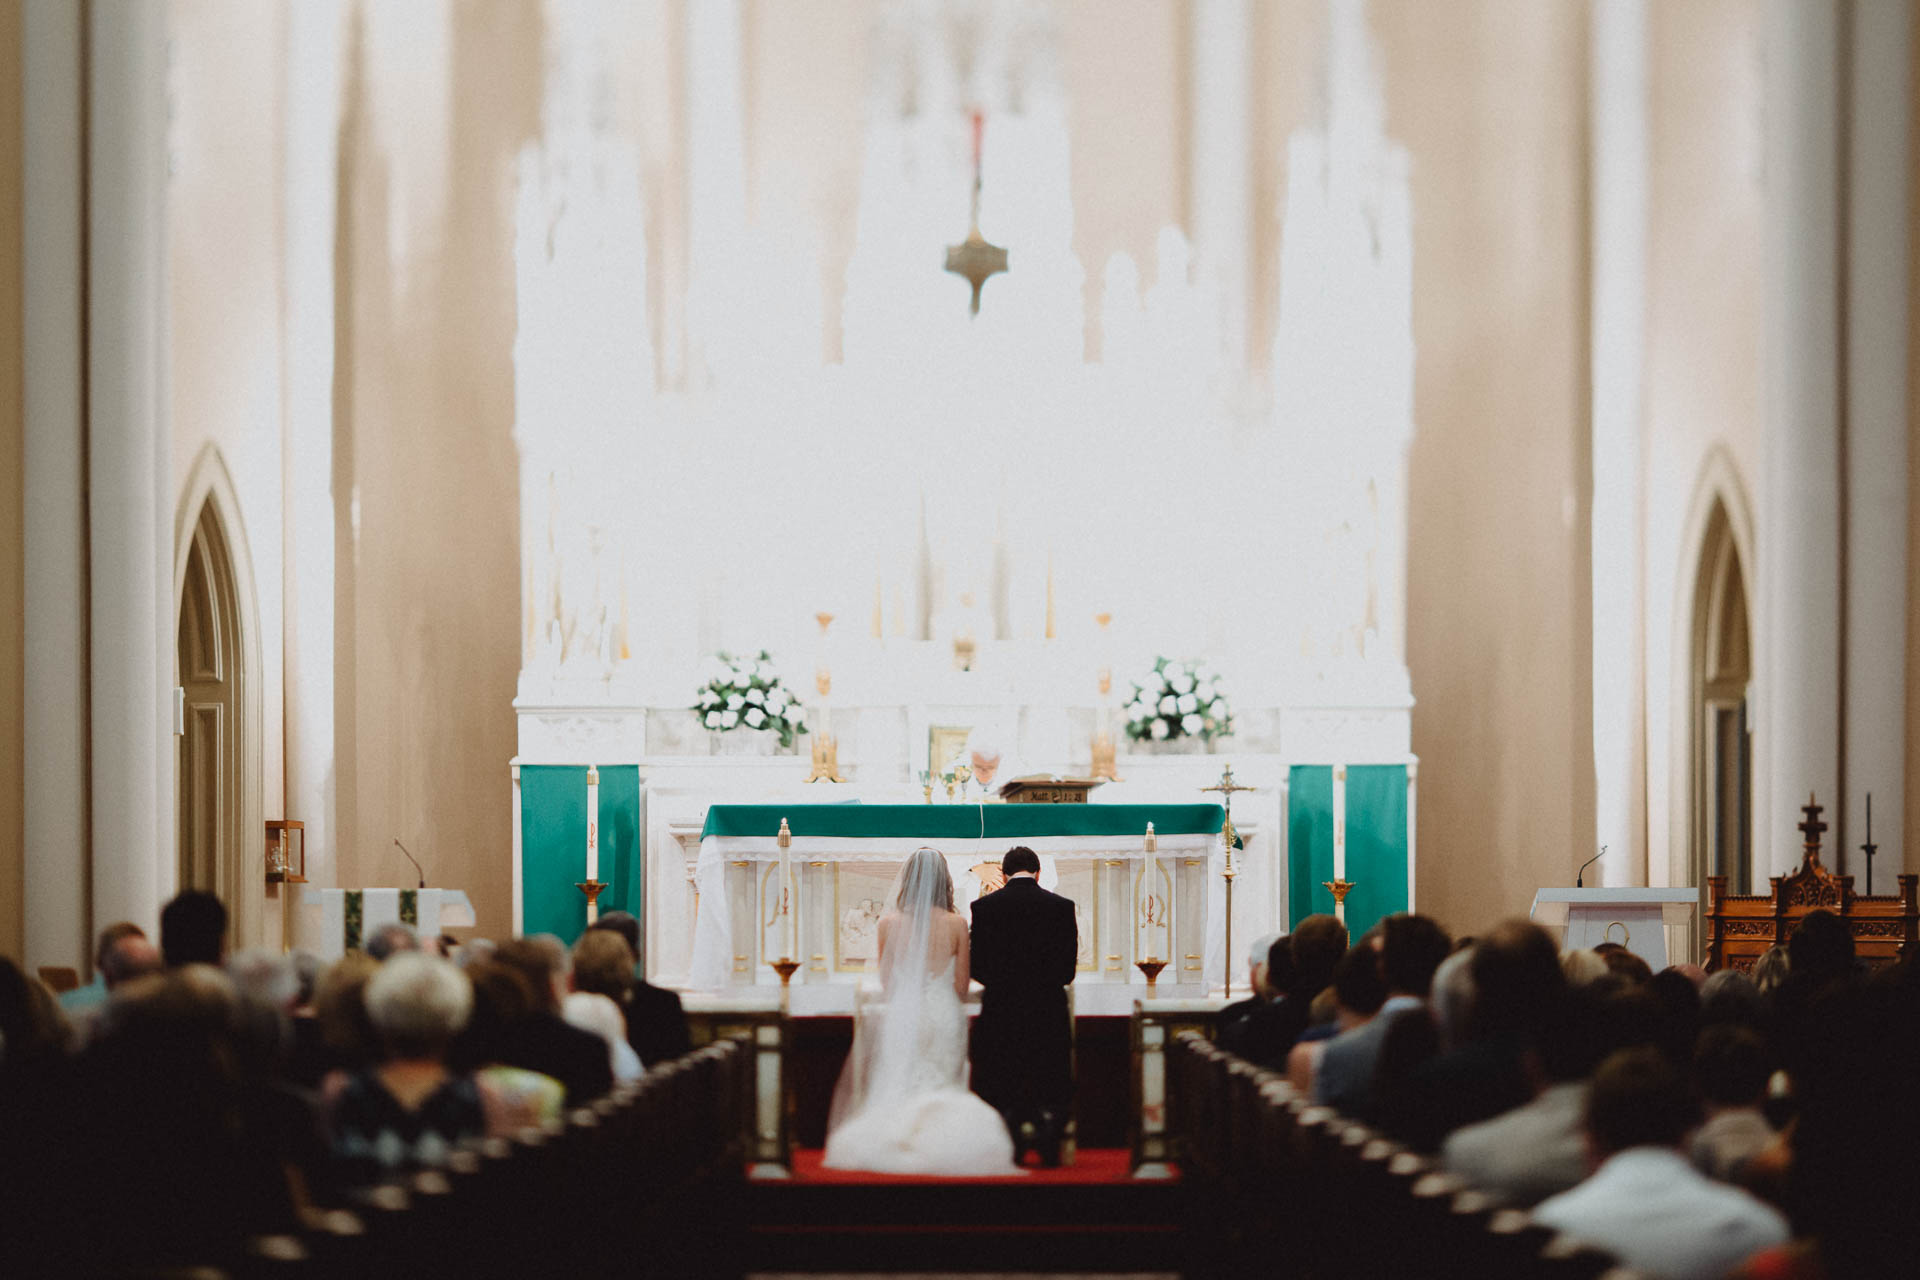 Keri-Joseph-Top-of-the-Market-Wedding-079@2x.jpg